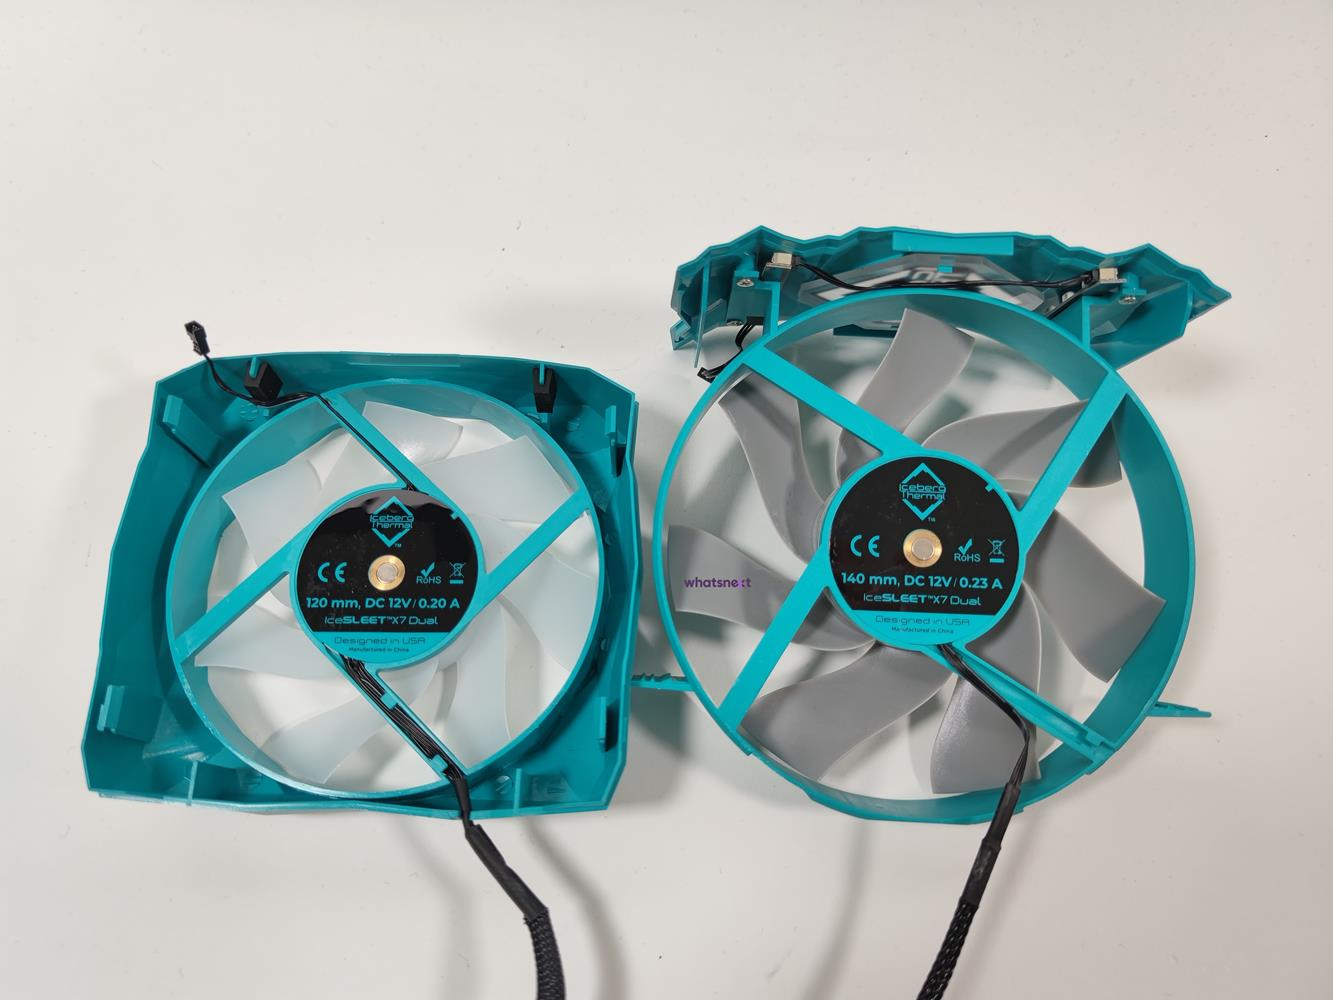 test Iceberg Thermal IceSLEET X7 Dual, recenzja Iceberg Thermal IceSLEET X7 Dual, opinia Iceberg Thermal IceSLEET X7 Dual